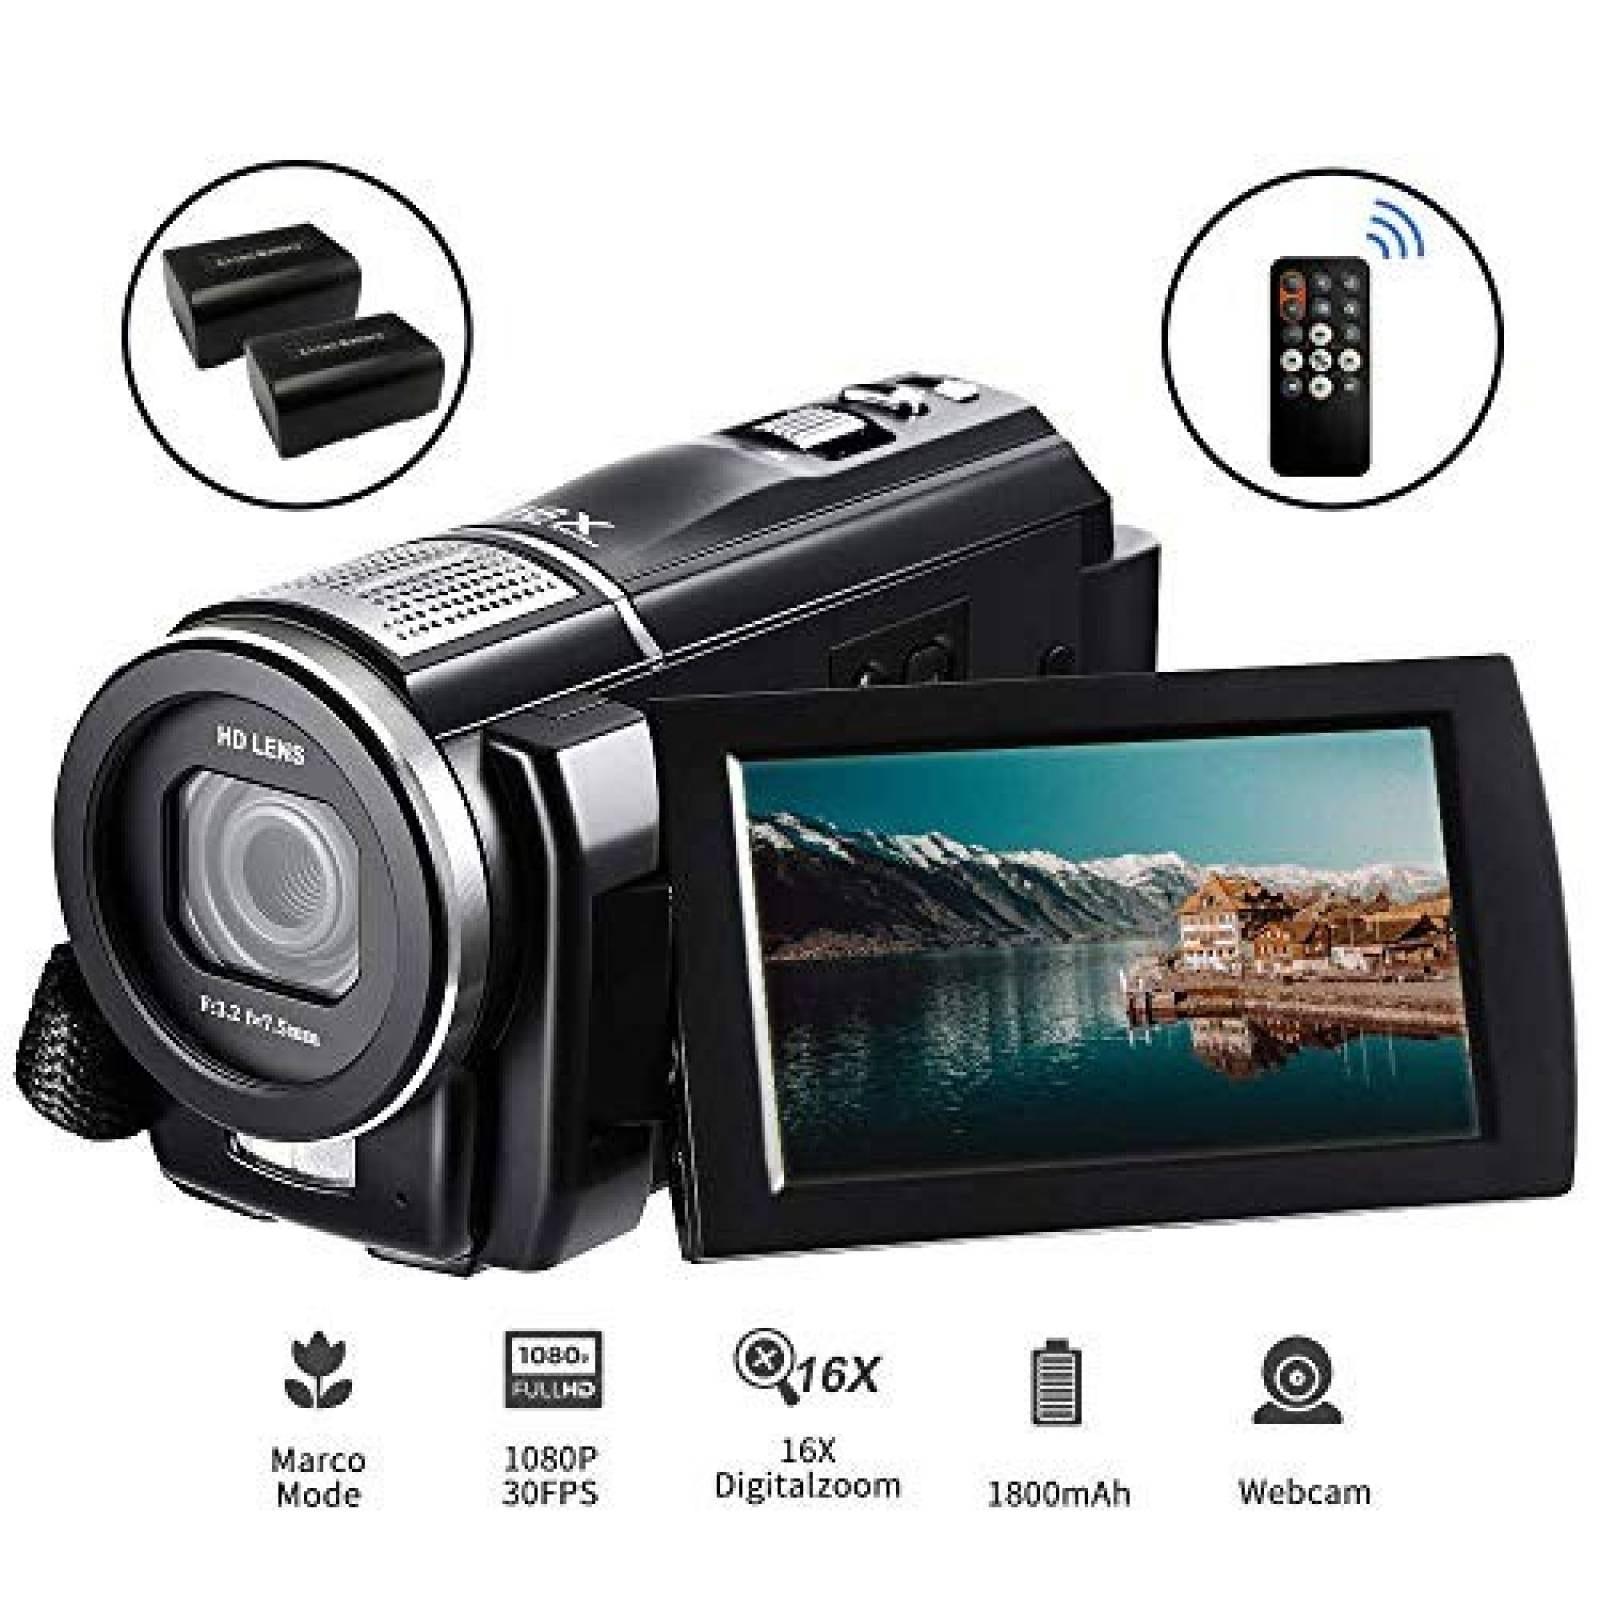 Kit cámara de video ORDRO 24 MP Full HD control y 2 baterías